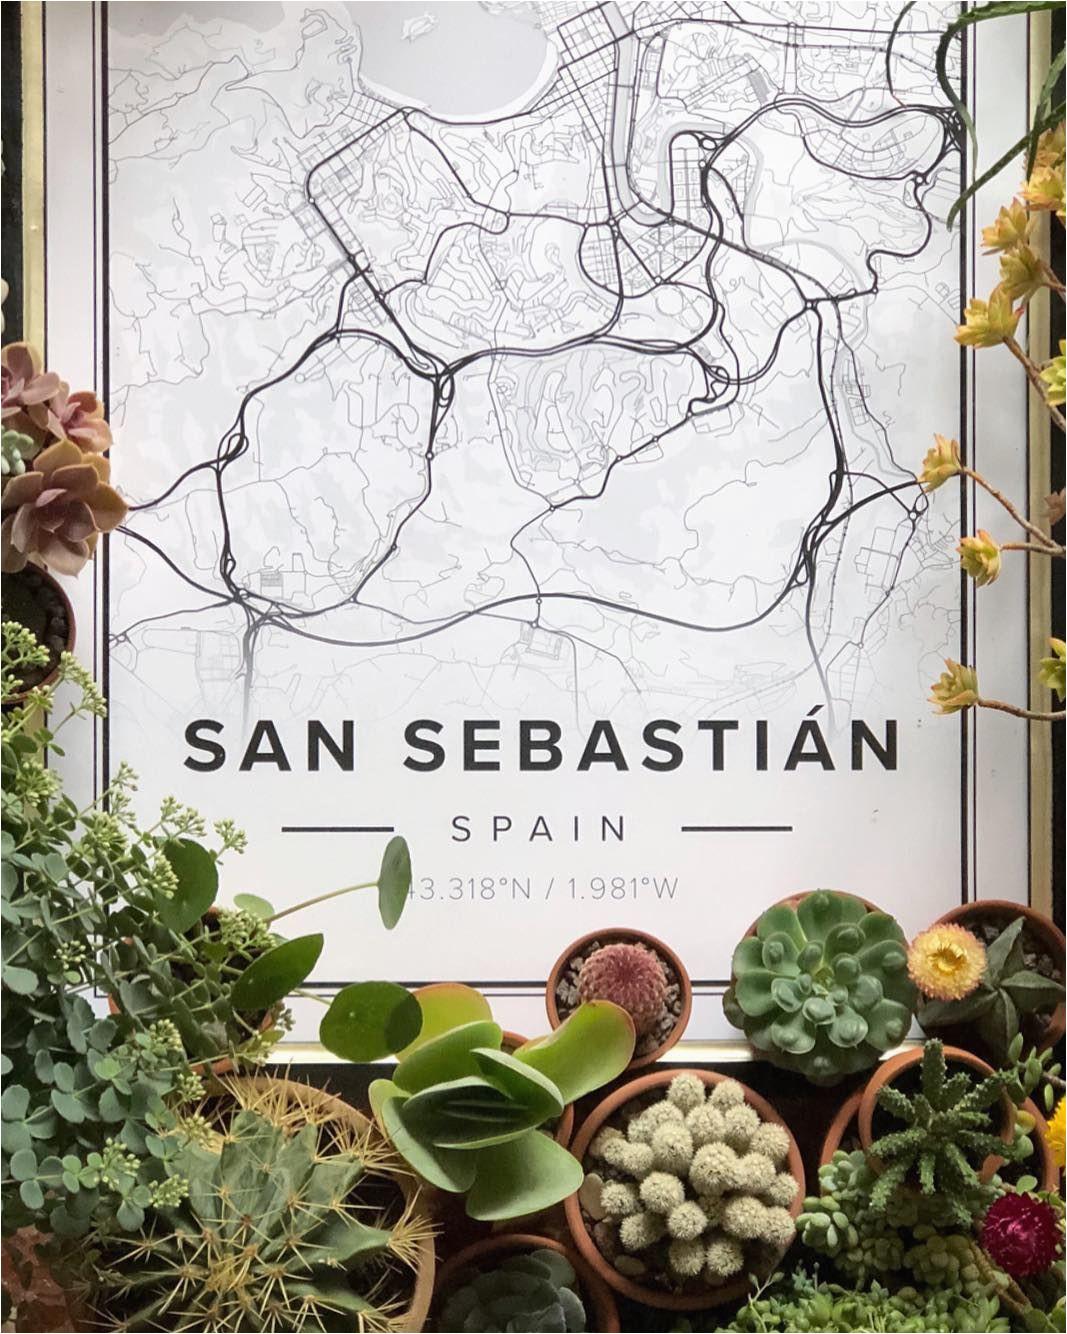 map poster of san sebastian spain print size 50 x 70 cm available